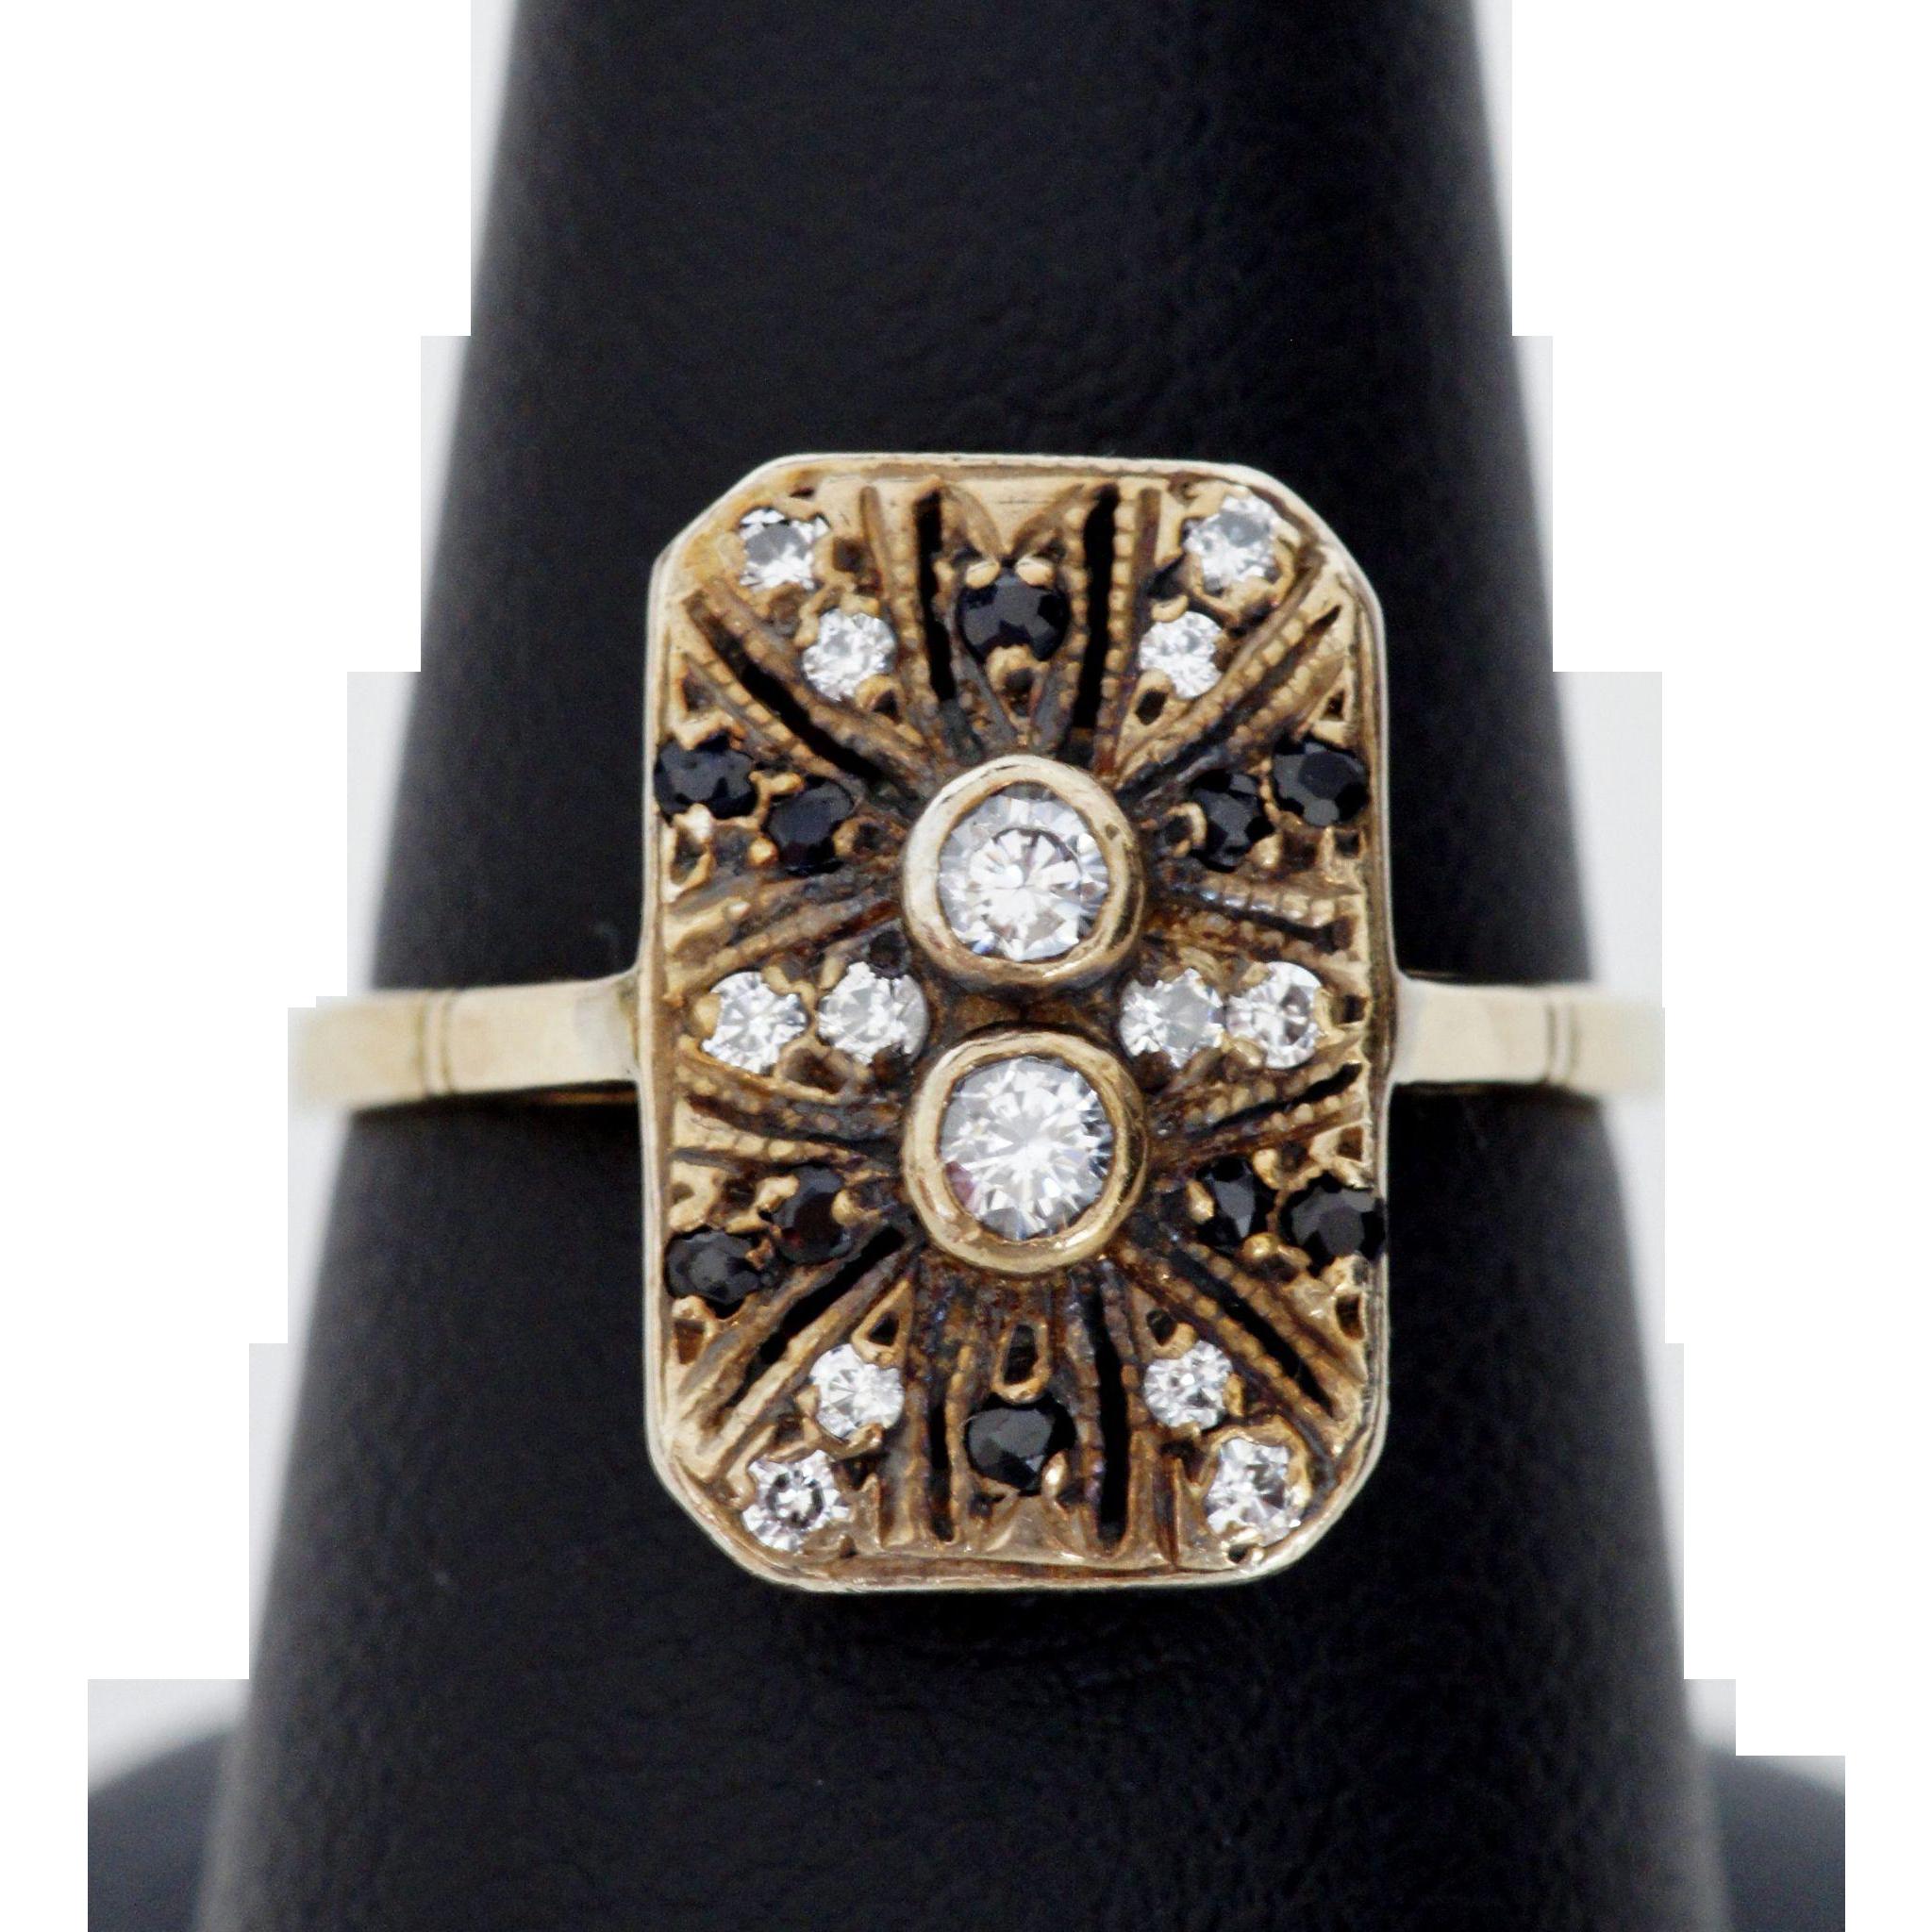 Adorable Art Deco Ring, Diamond and Sapphire, 14K